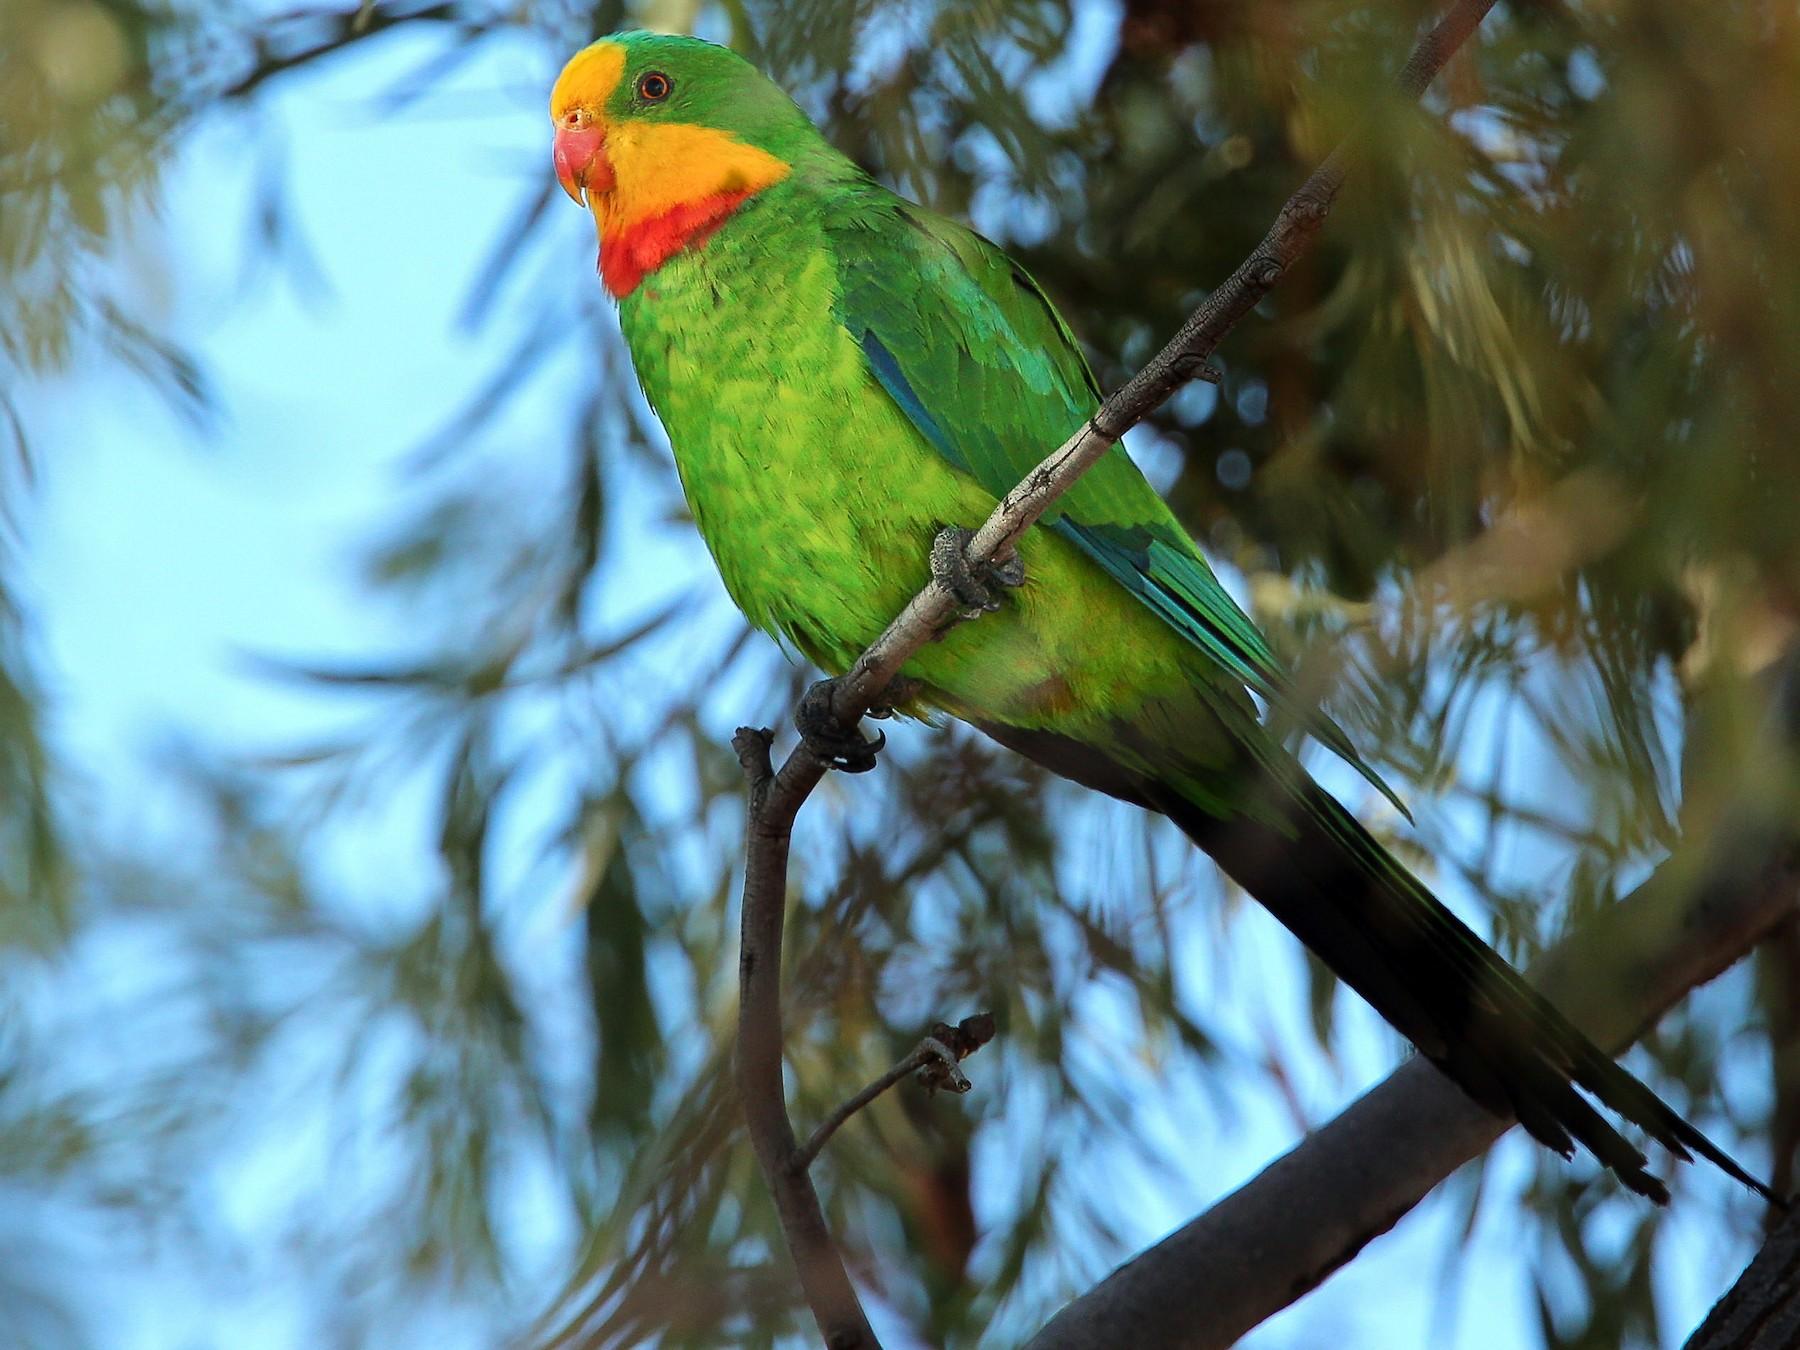 Superb Parrot - Alex Burdo